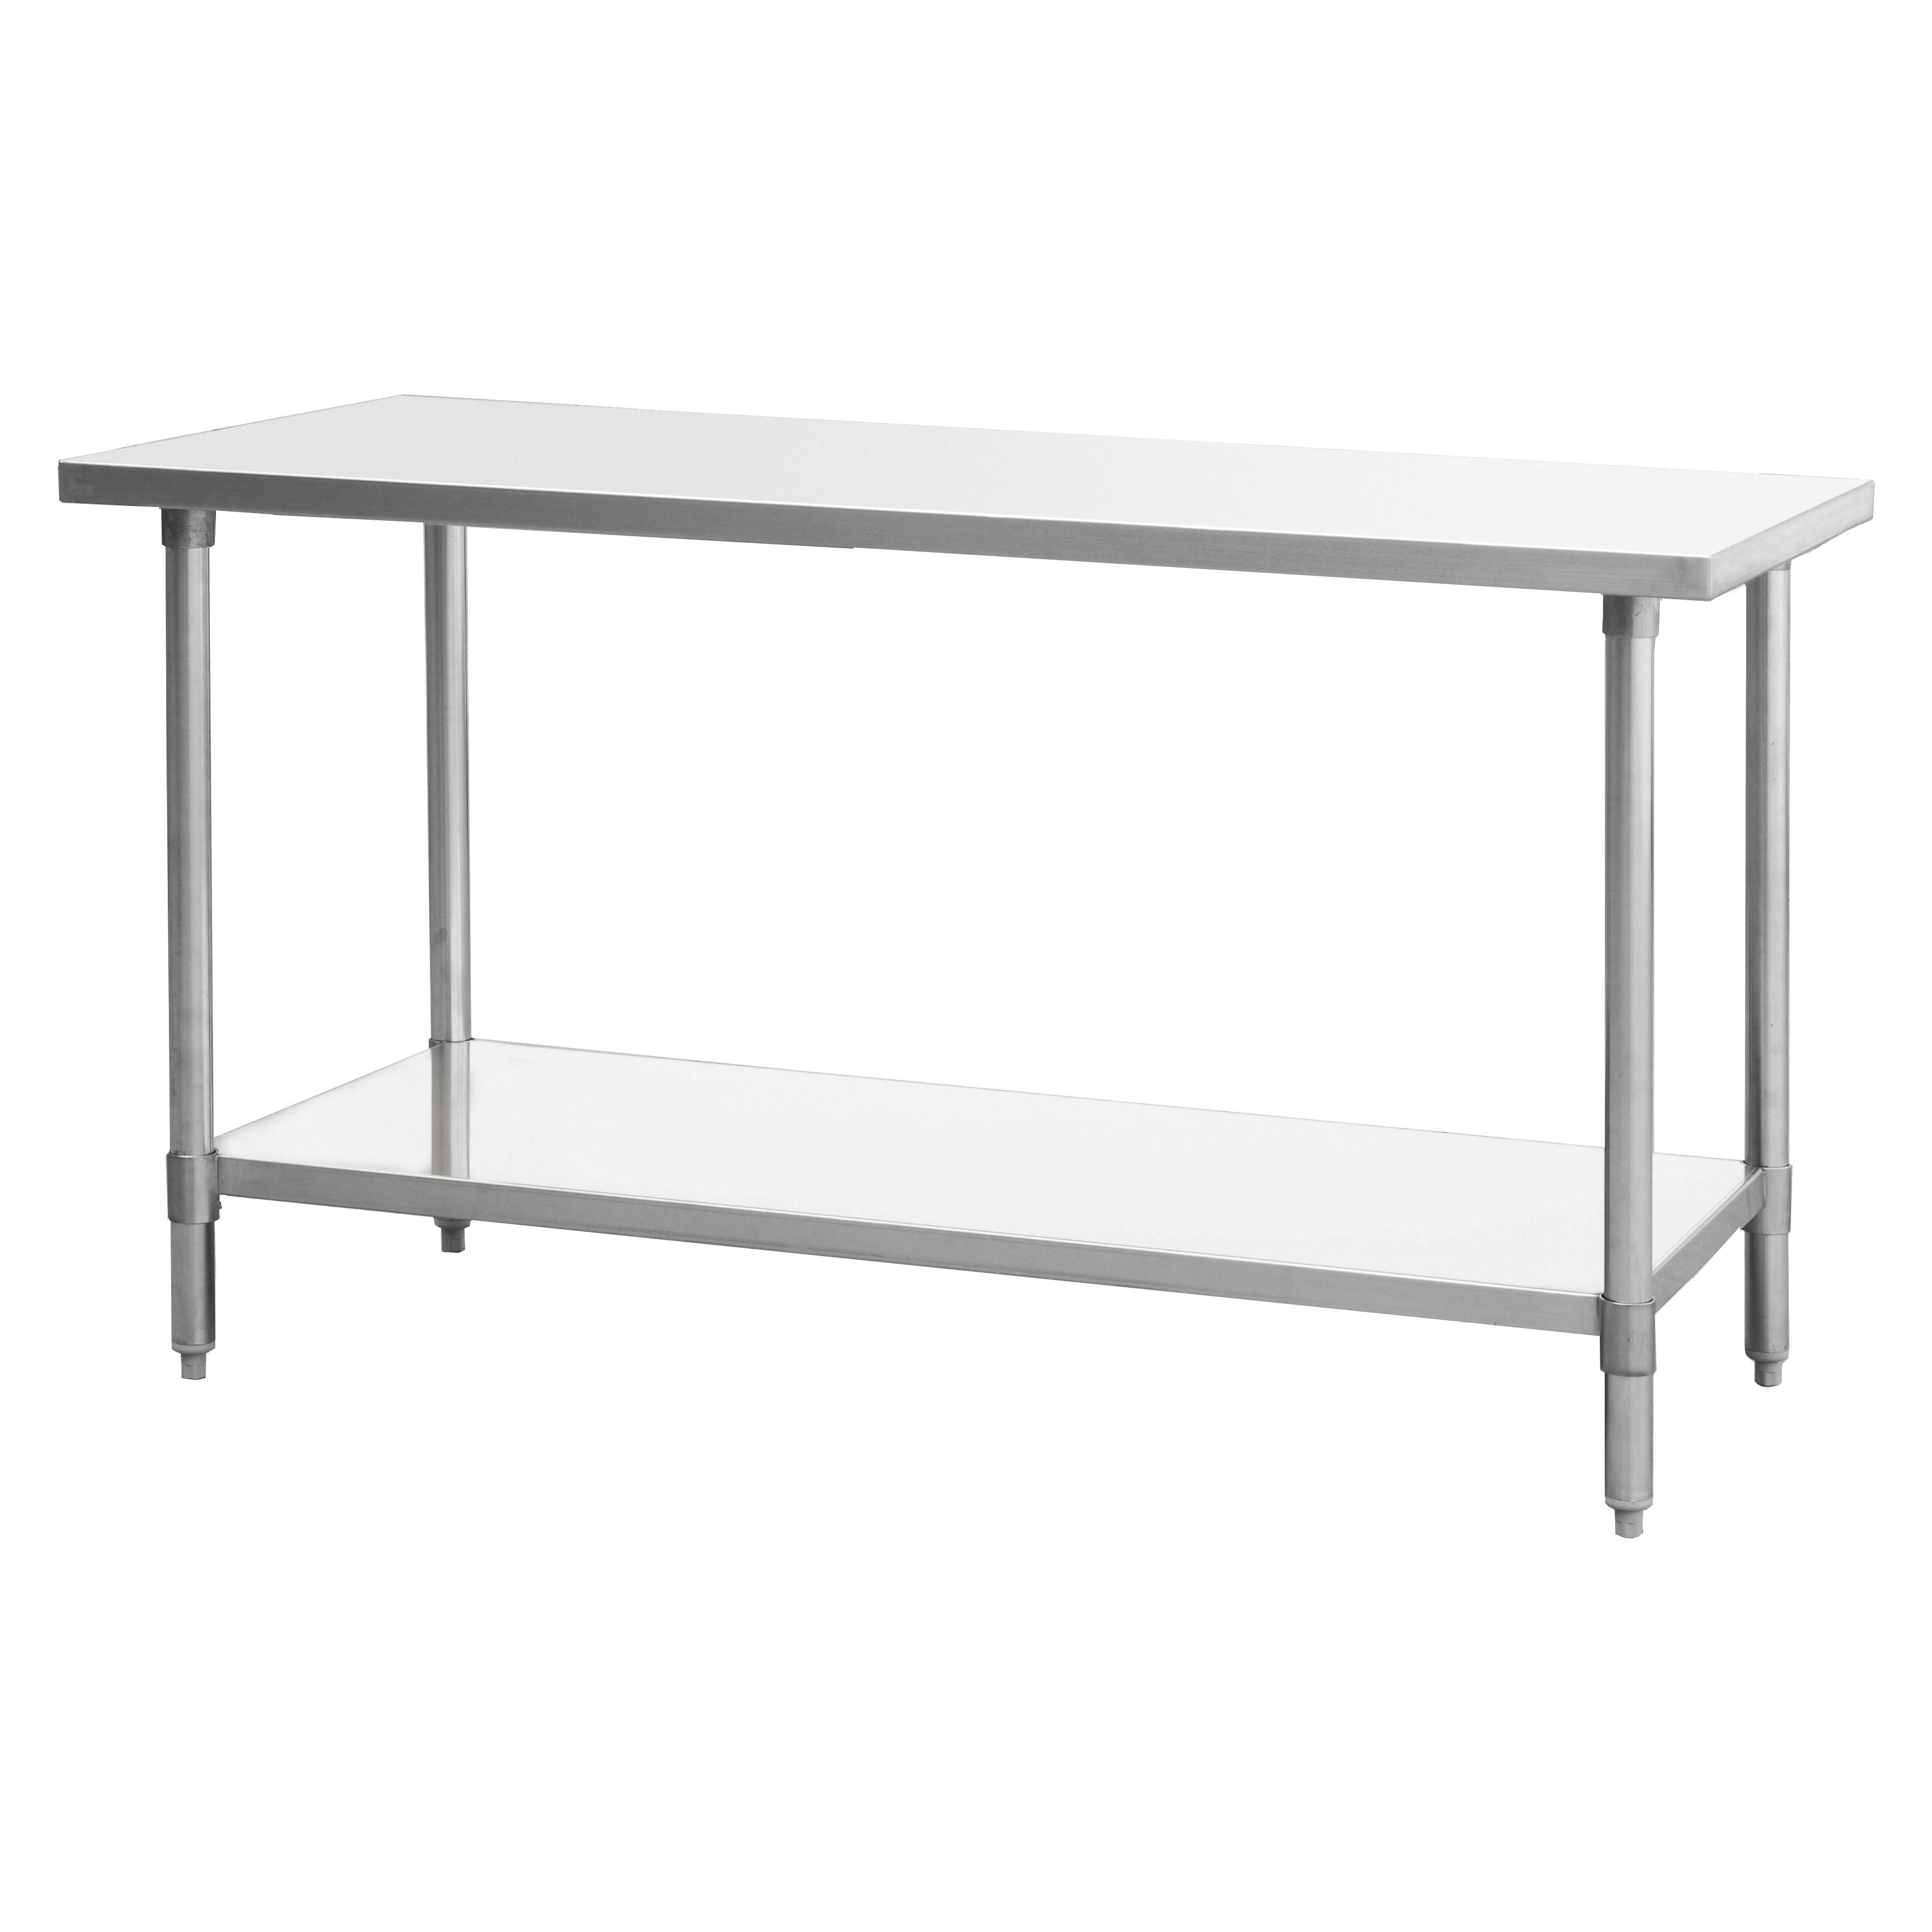 Atosa USA SSTW-2460 work table,  54